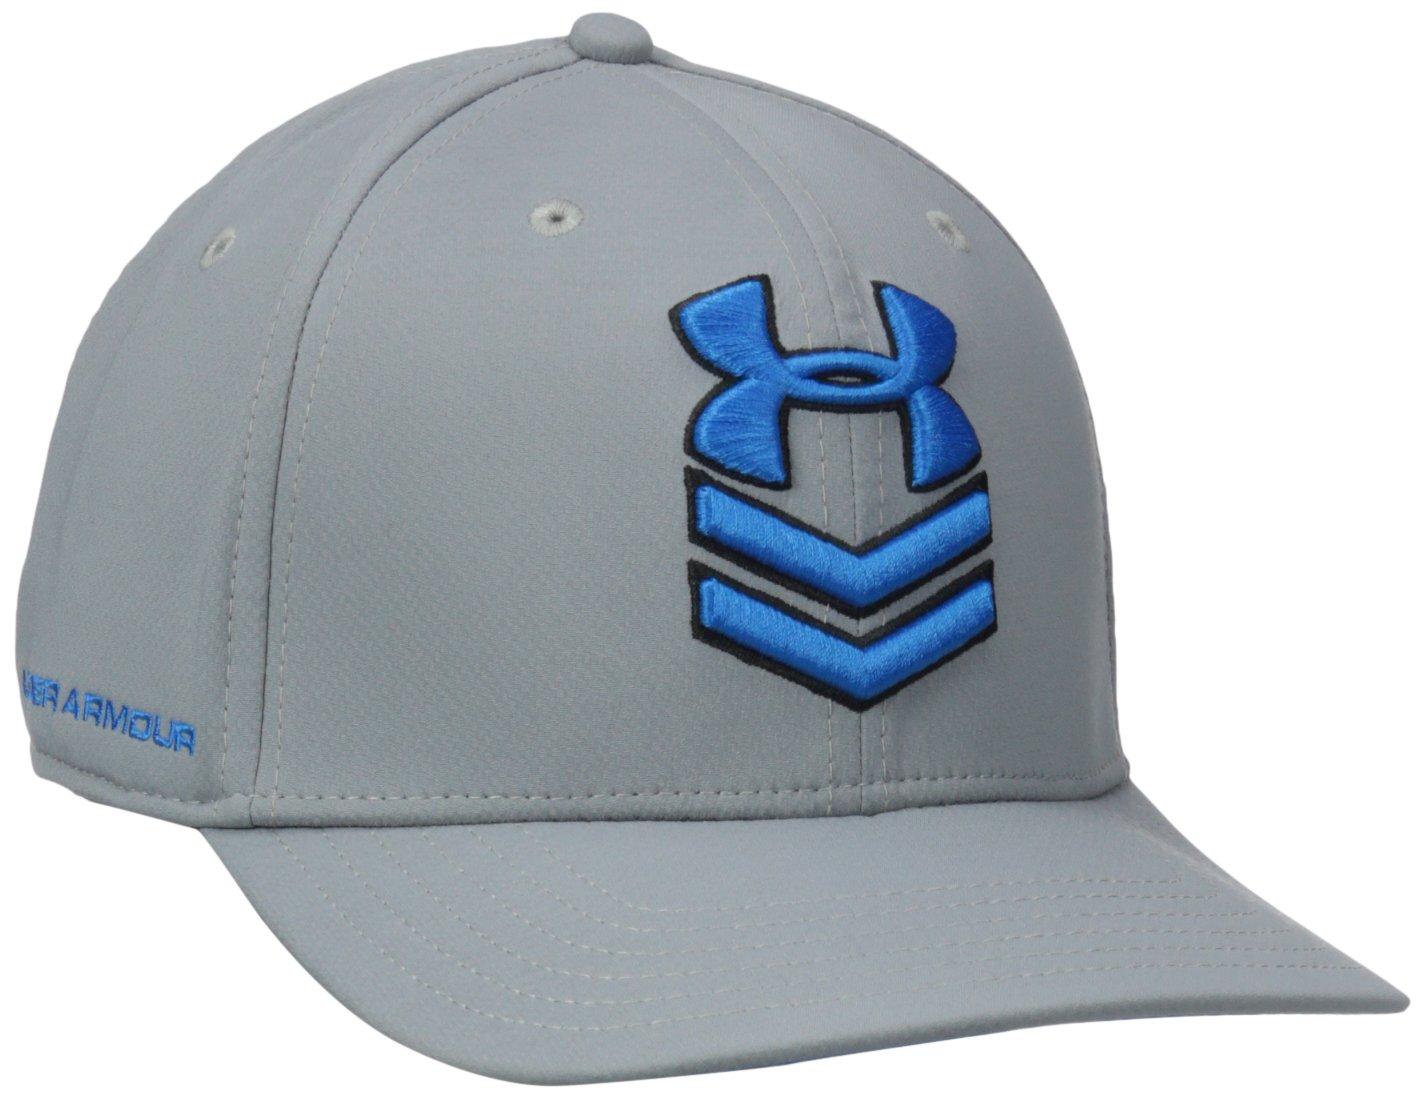 Under Armour Men's Undeniable Stretch Fit Cap Black /Graphite Medium/Large Under Armour Accessories 1254125 1254125_001-M/L